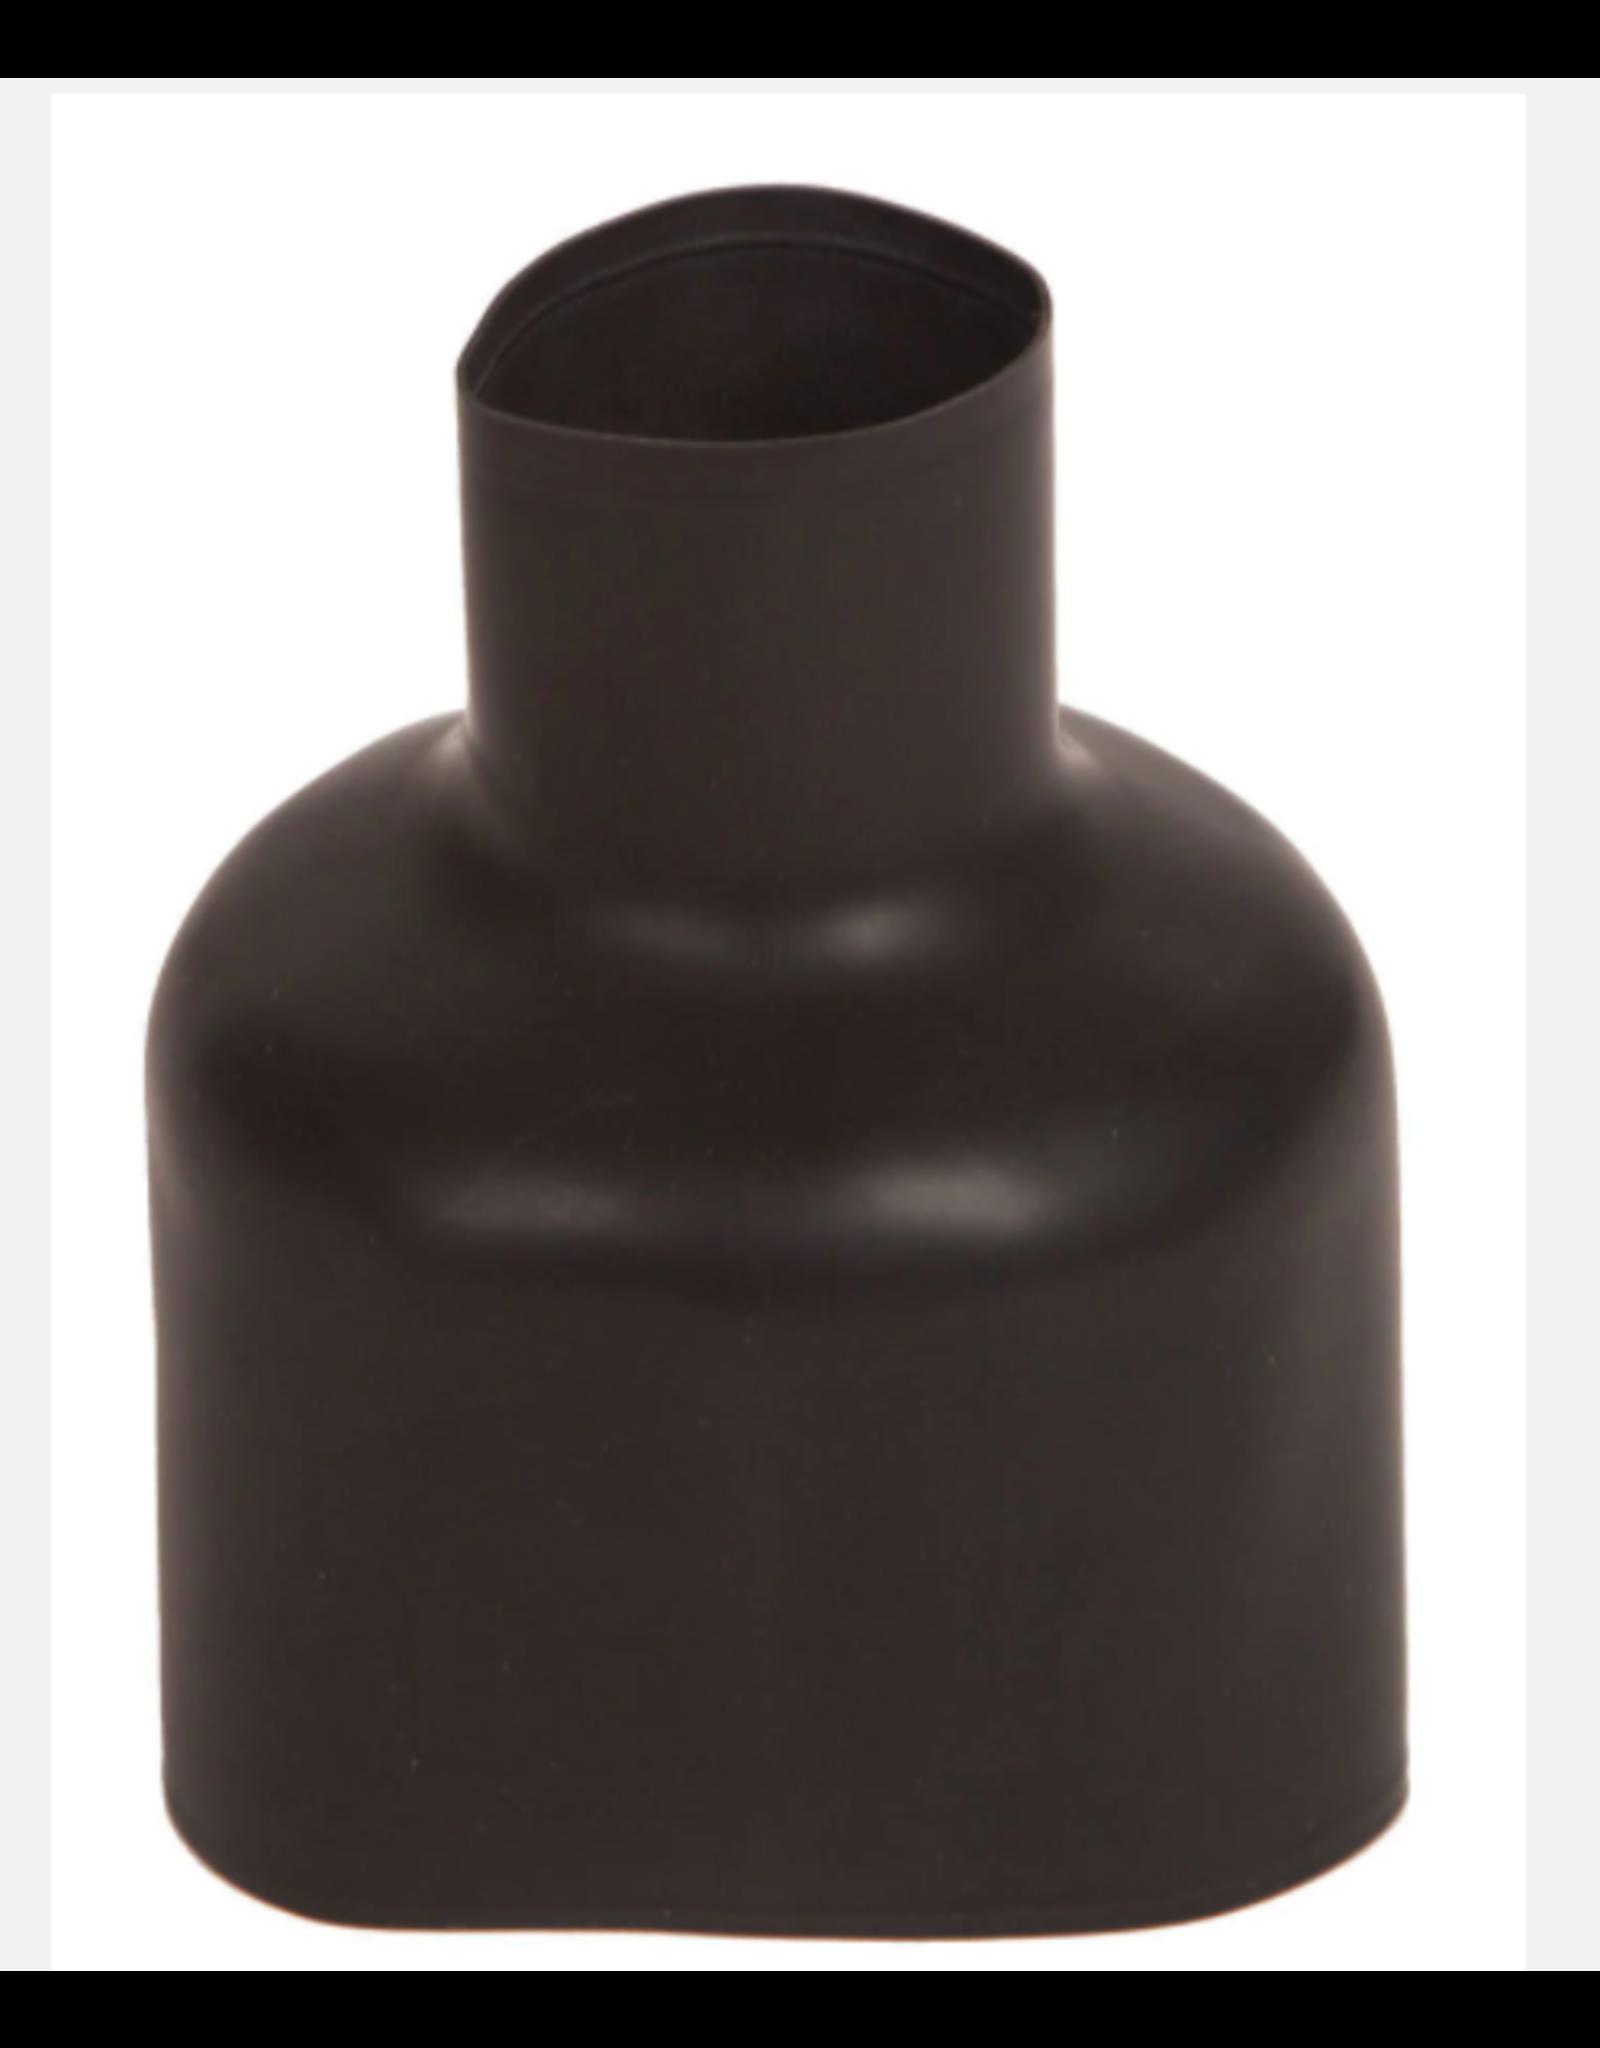 Kokatat Kokatat Drysuit Replacement Gaskets